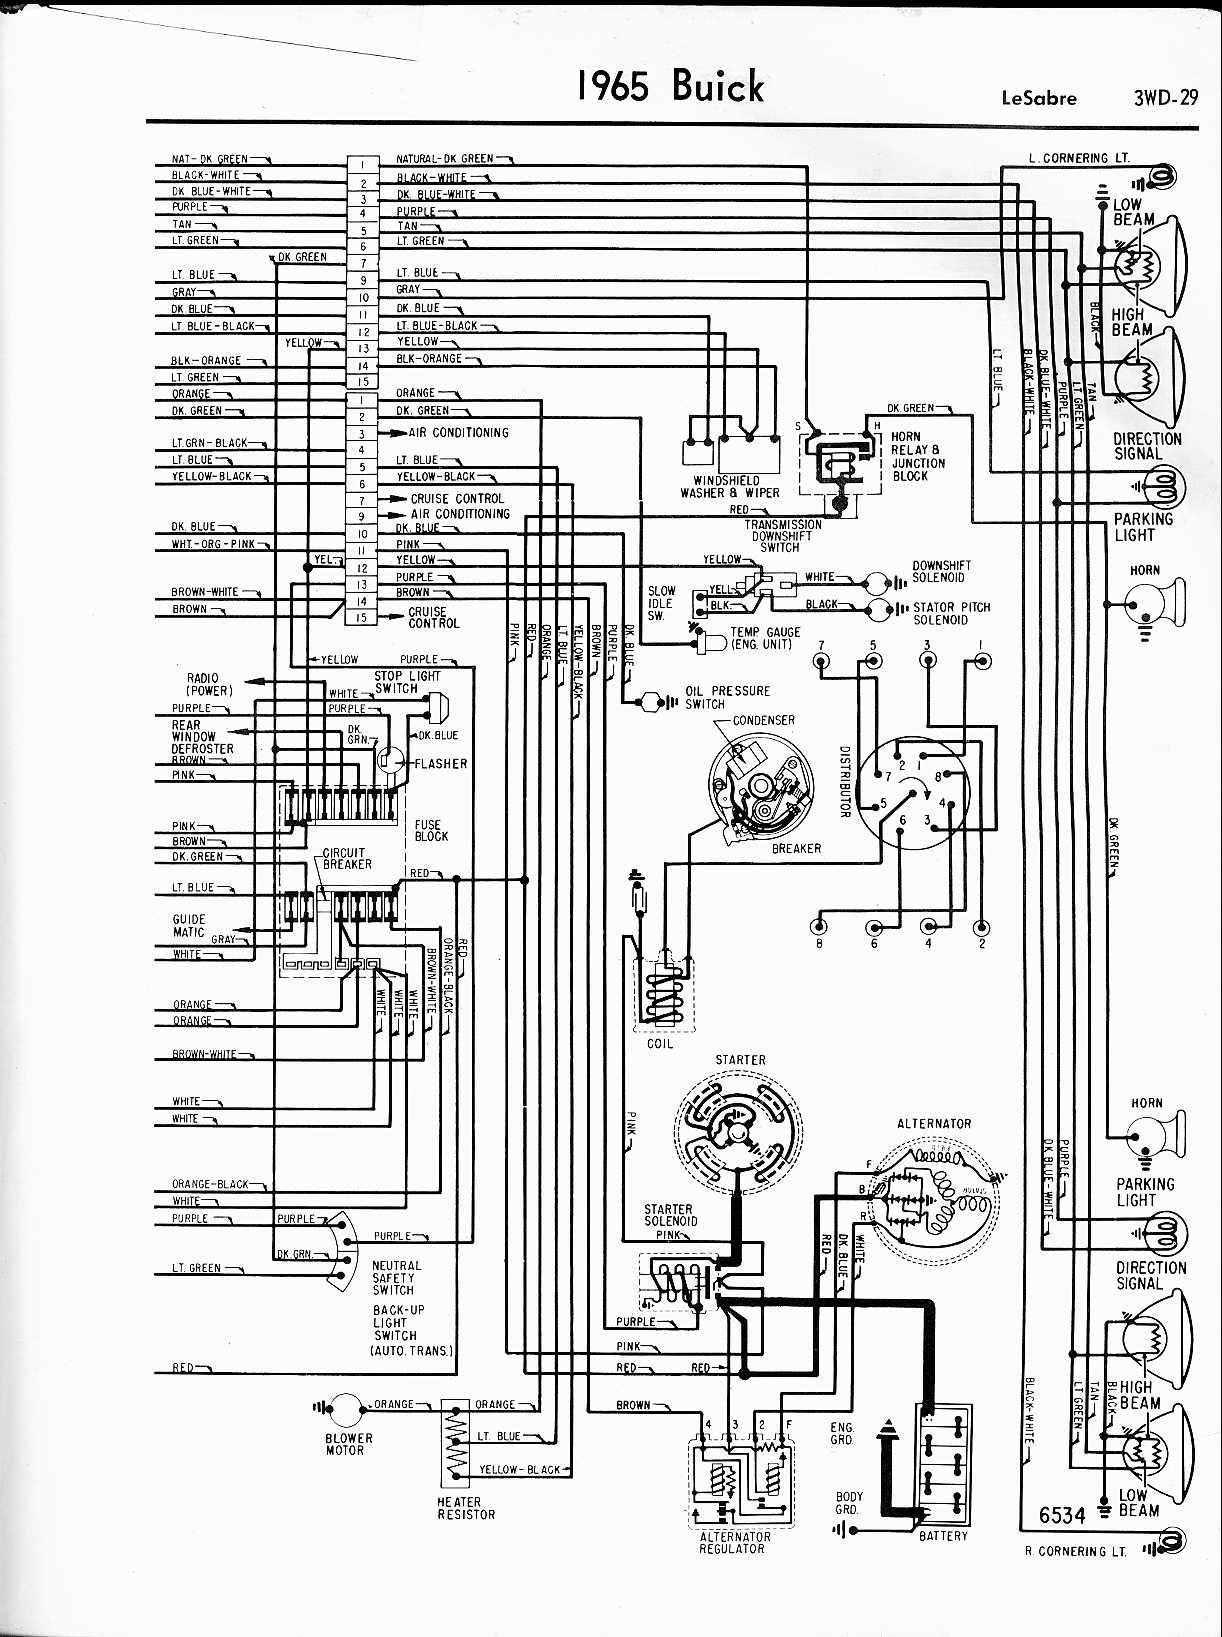 1997 Buick Lesabre Ignition Diagram | Wiring Diagram - 2000 Honda Accord Radio Wiring Diagram